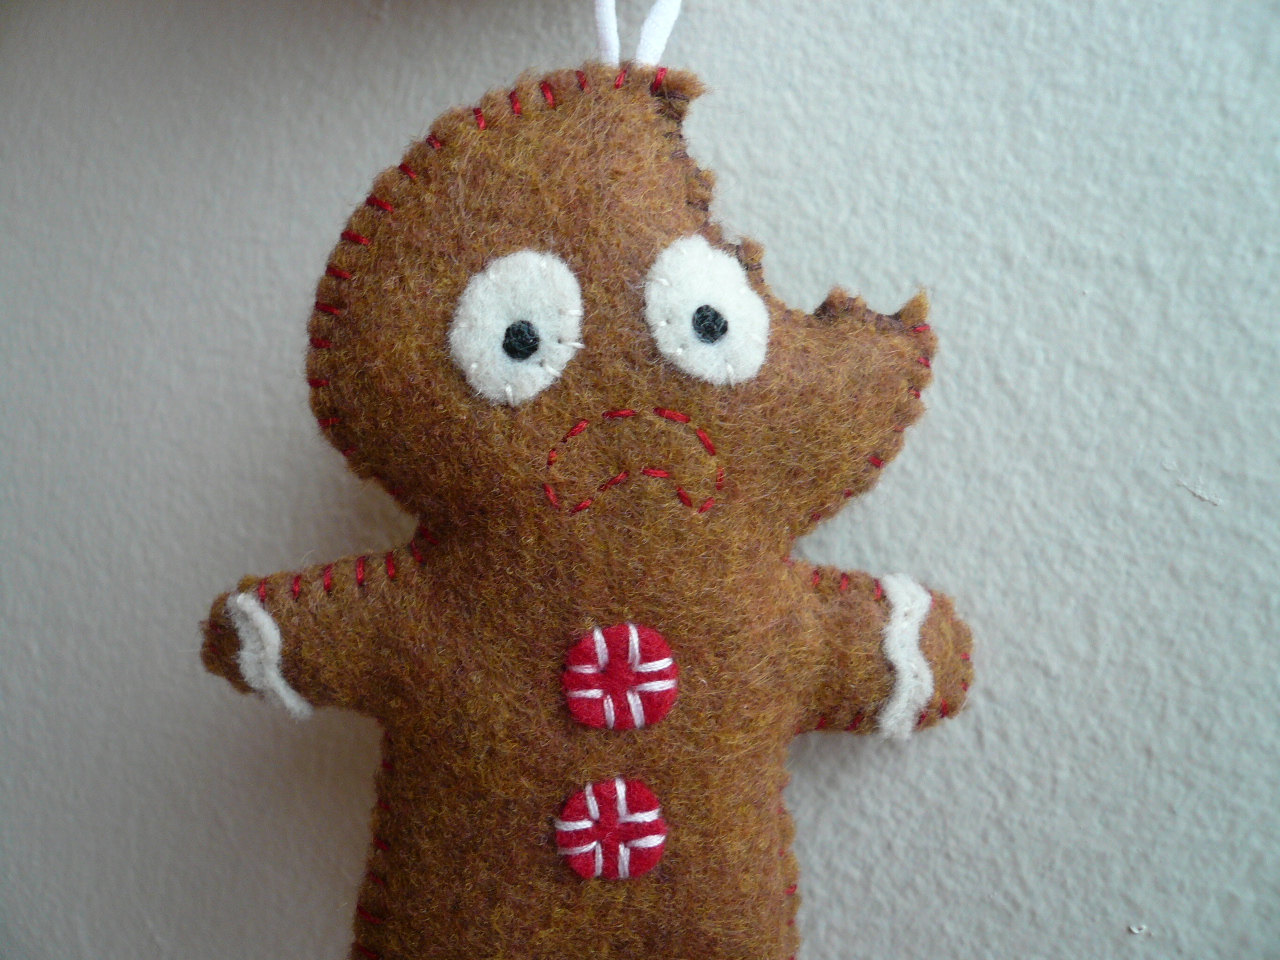 Gingerbread man ornaments - Christmas Ornaments Terrified Gingerbread Man